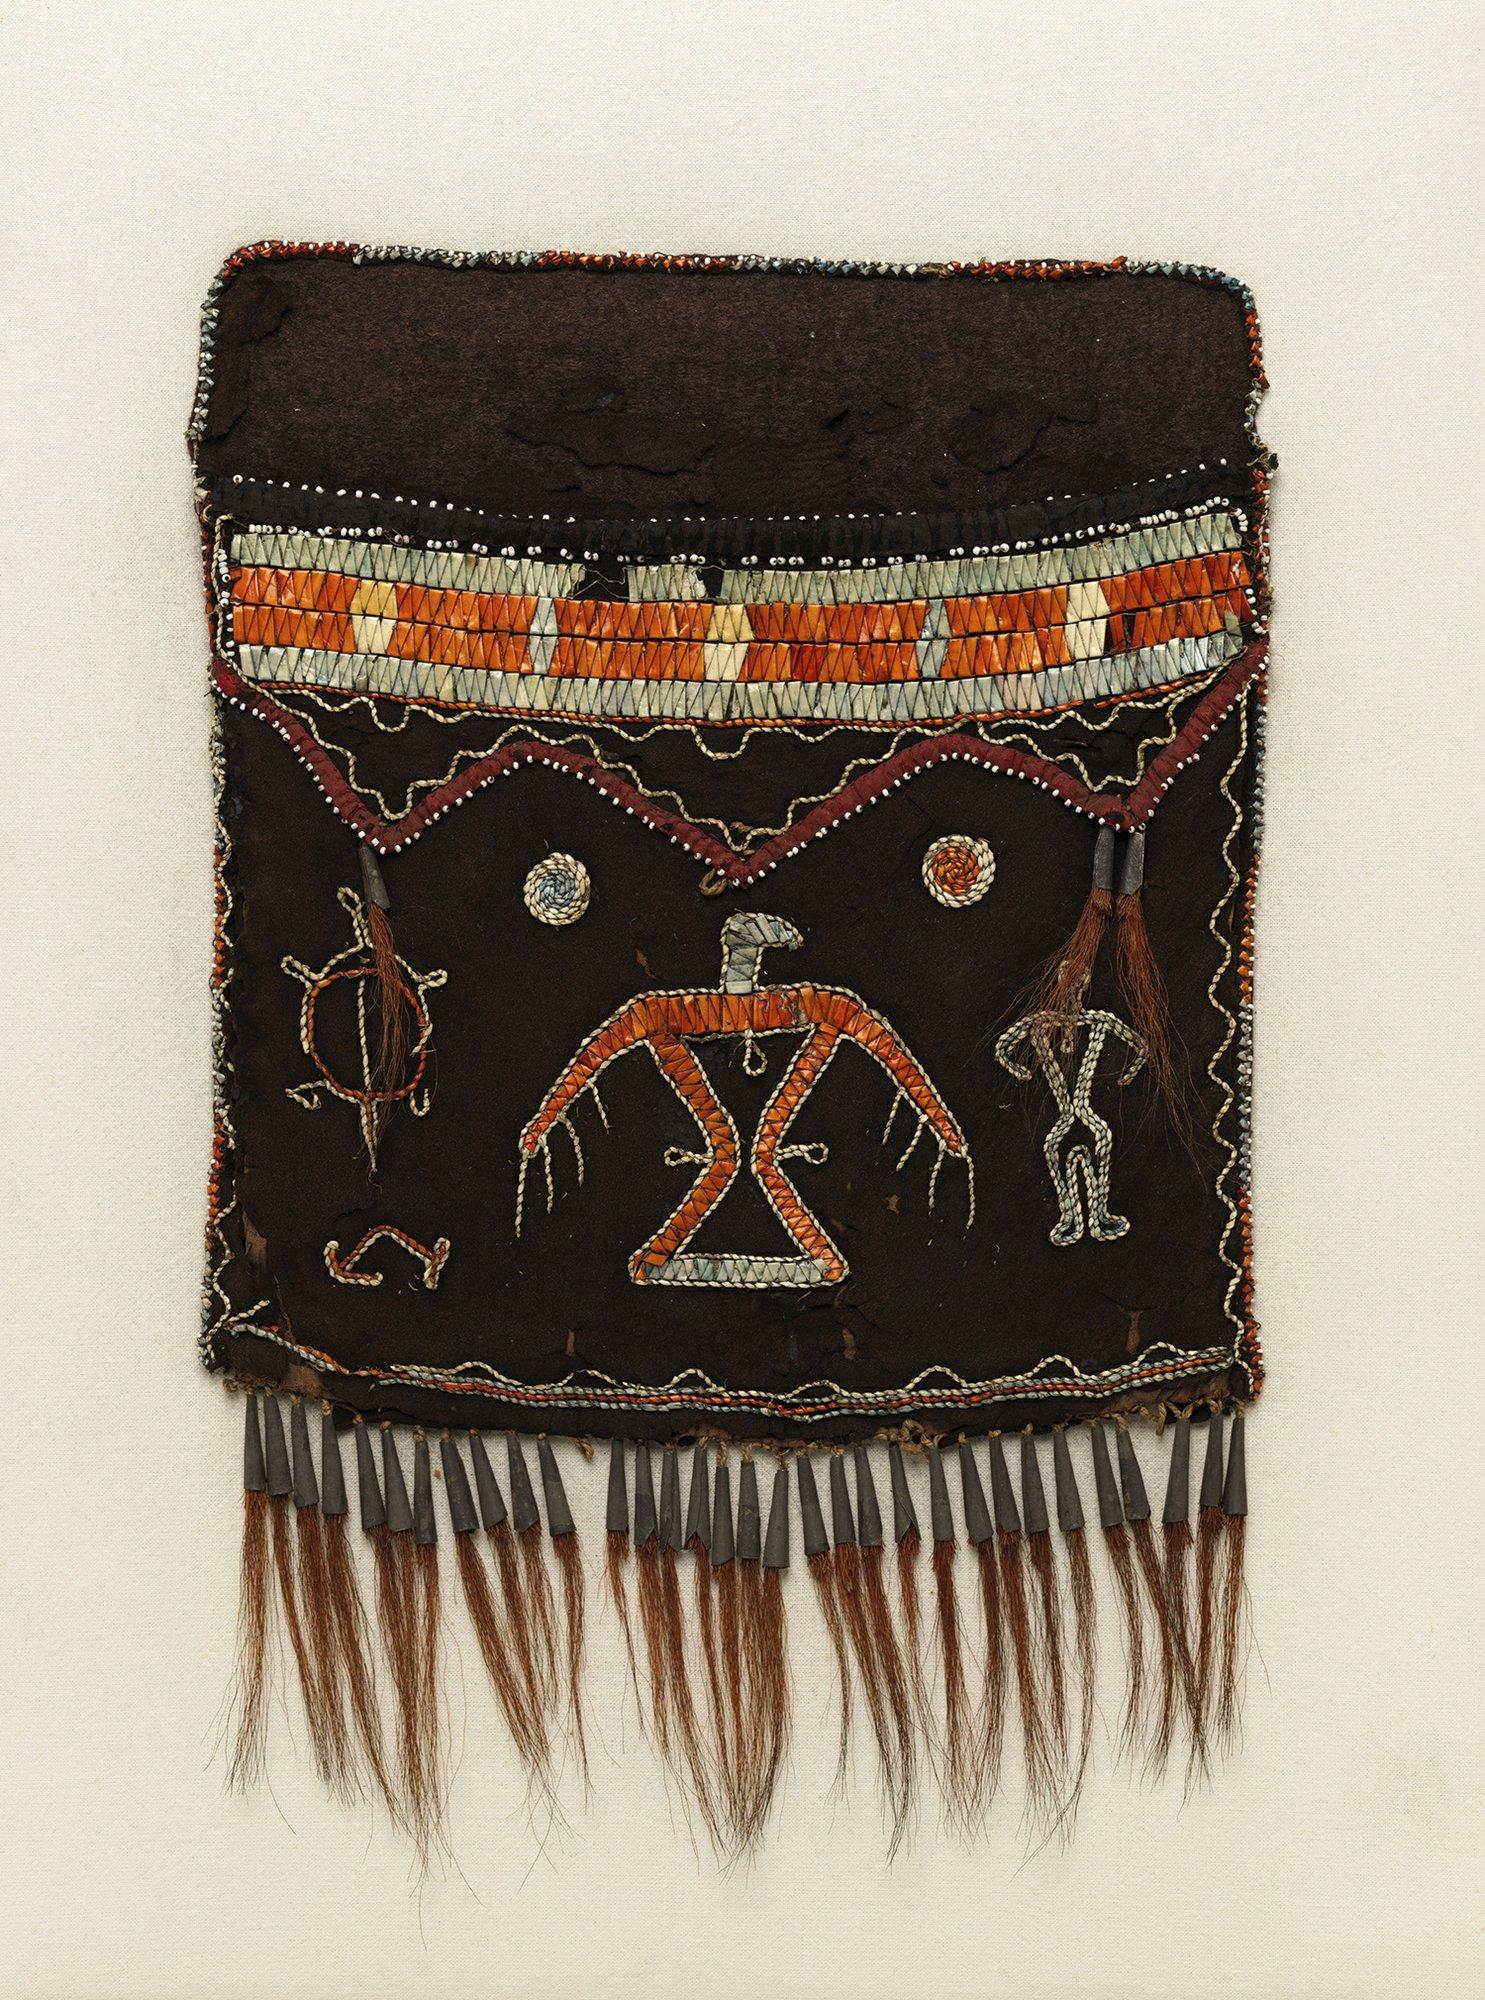 Native American art finally arrives at Met's American Wing